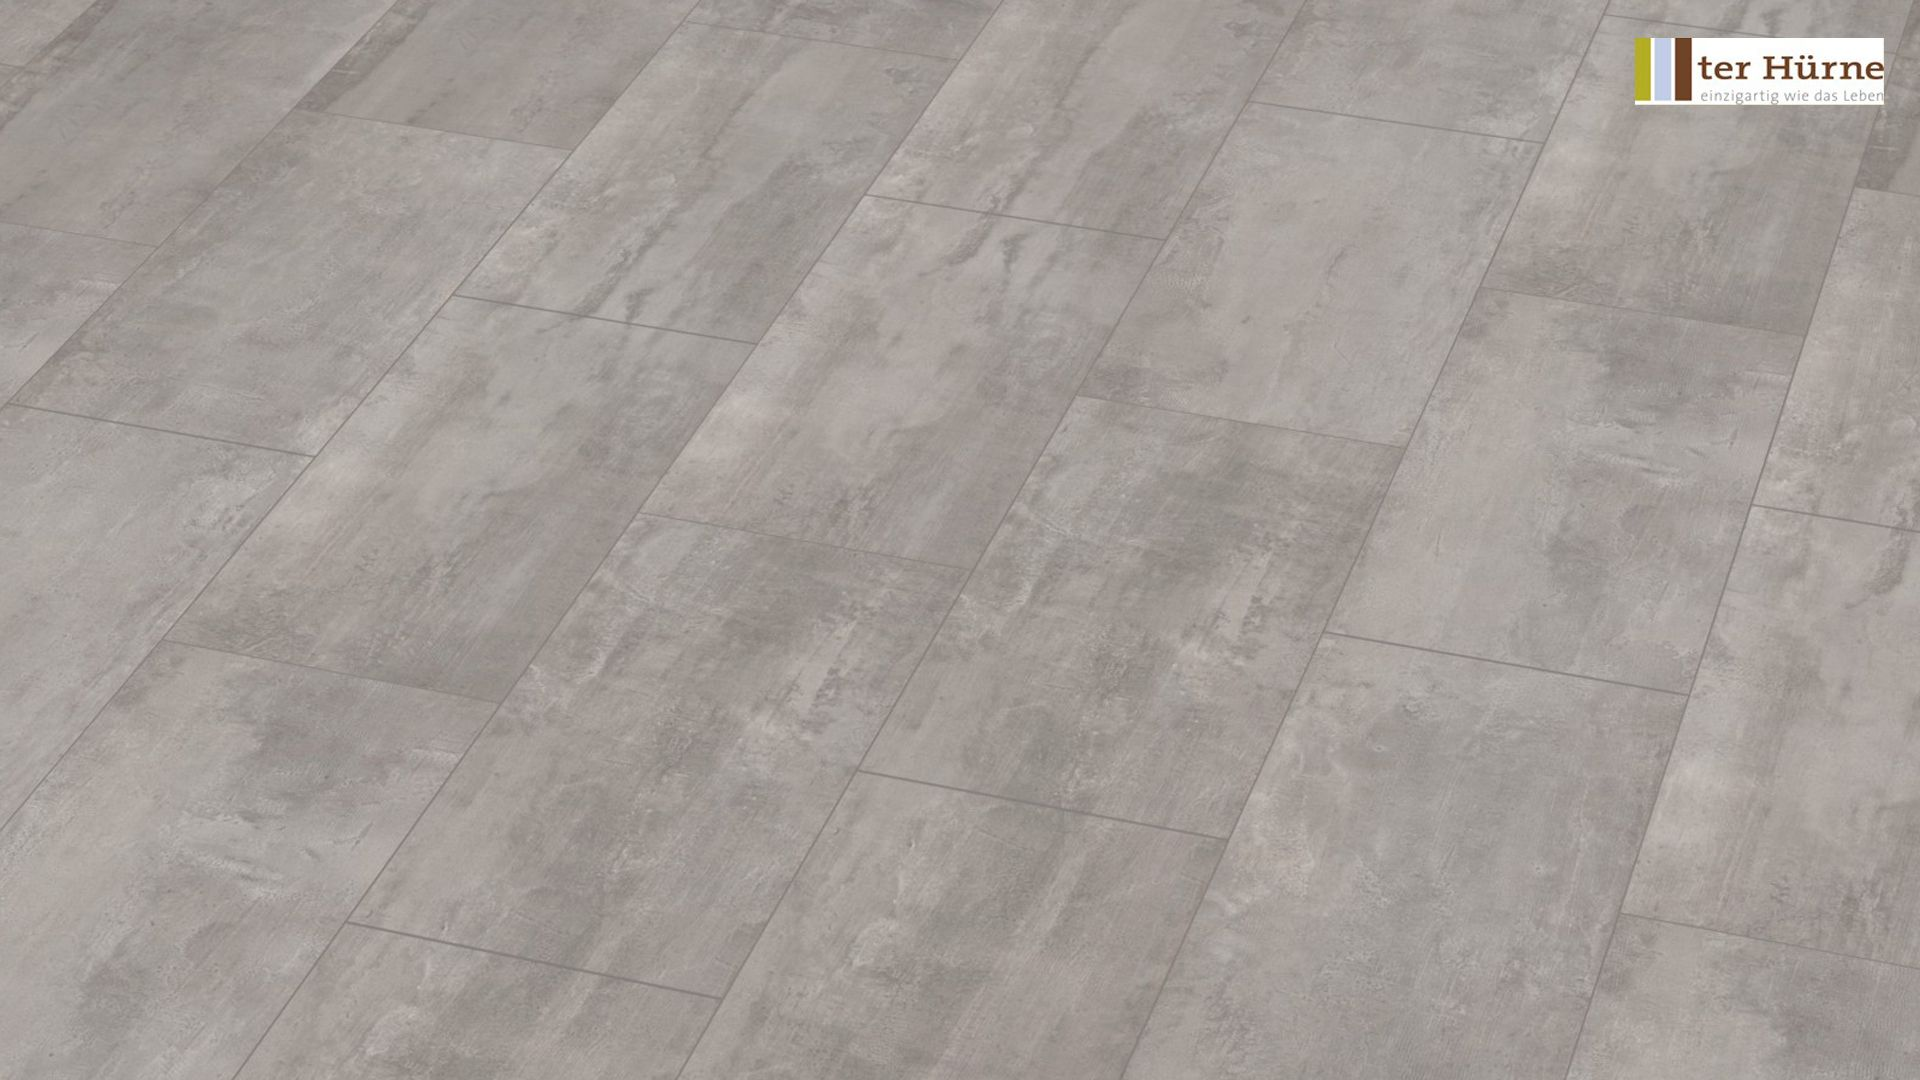 laminat betonoptik | pvc boden betonoptik günstig and sicher kaufen